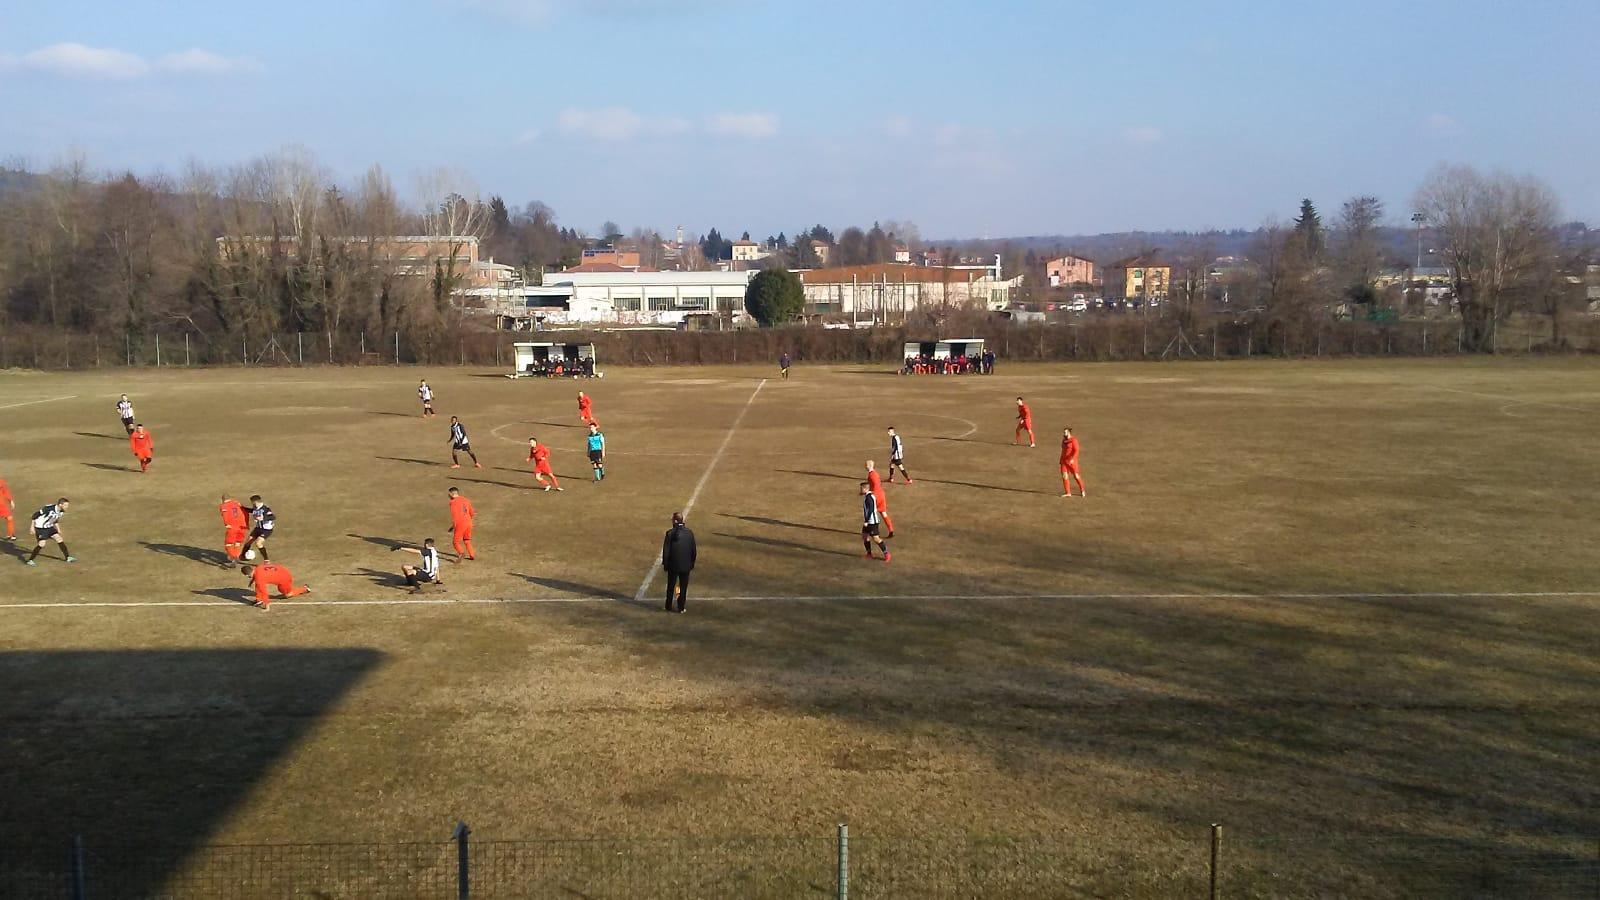 17^ giornata – Tris Malnatese, tonfo Jeraghese! Bene Angerese e Pro Cittiglio, 7 goal tra Rancio e Casmo